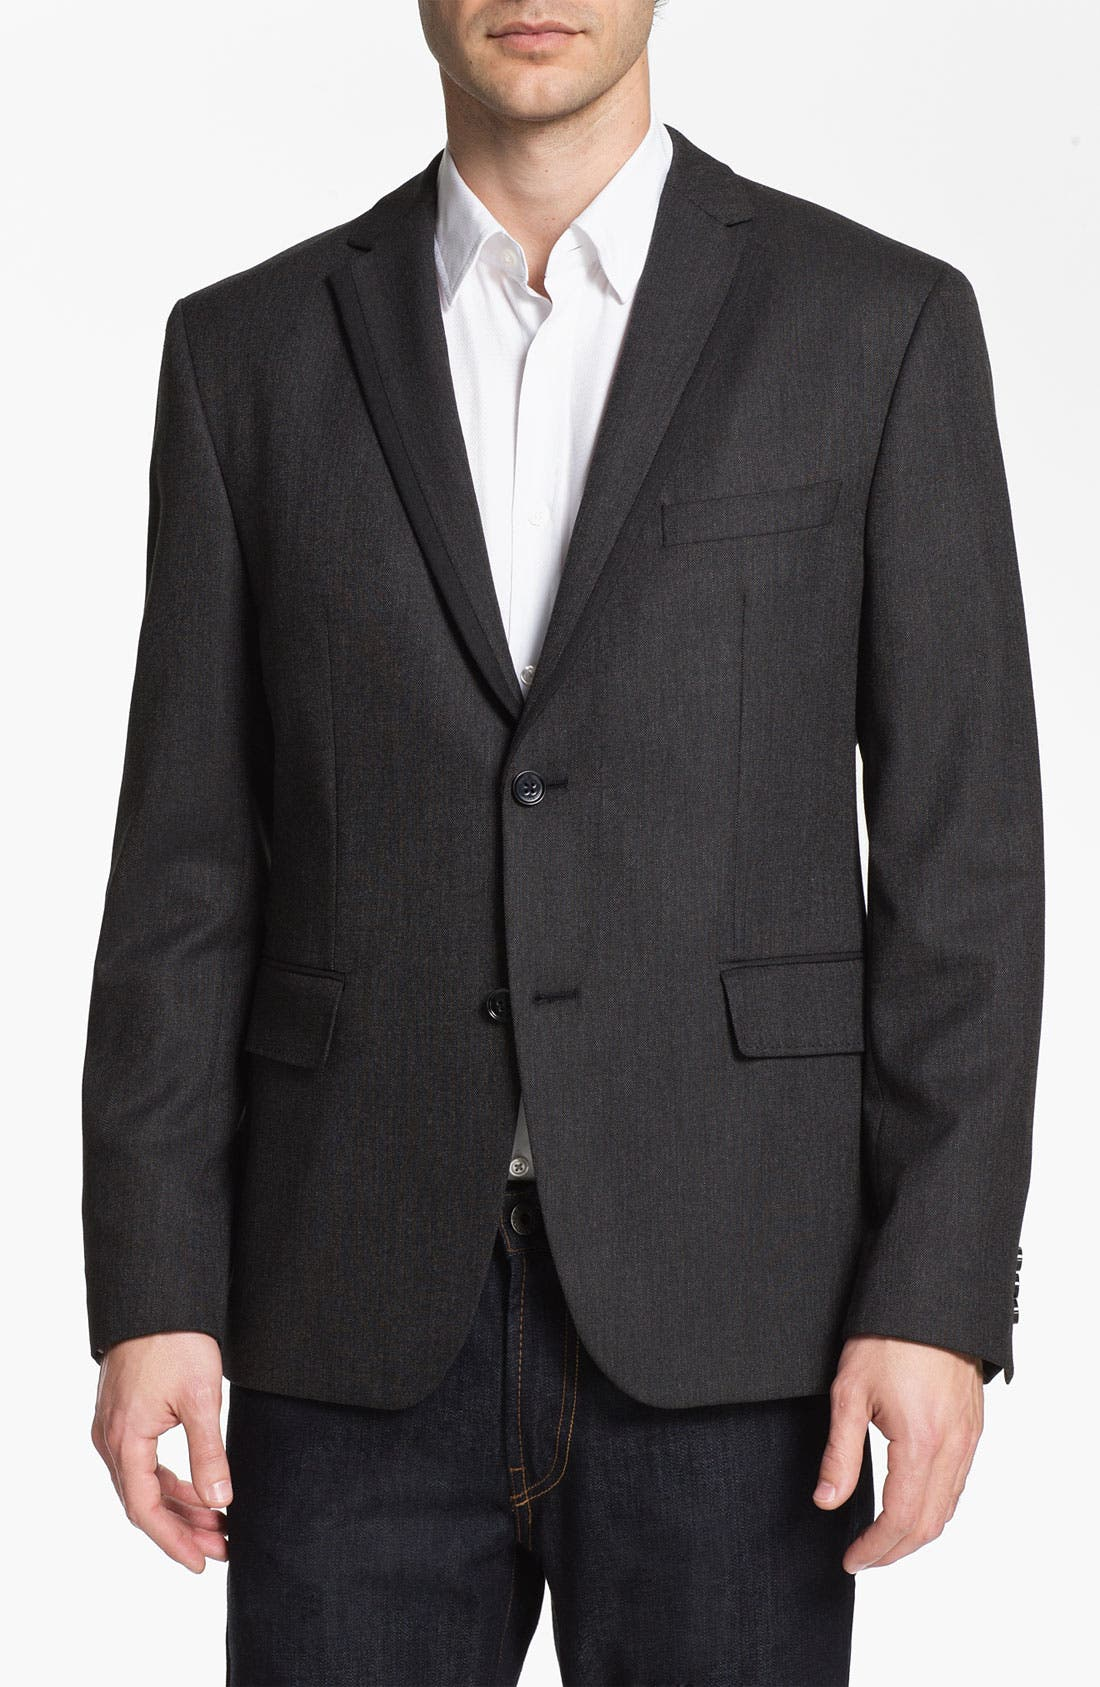 Alternate Image 1 Selected - BOSS Black 'Coastes' Trim Fit Blazer